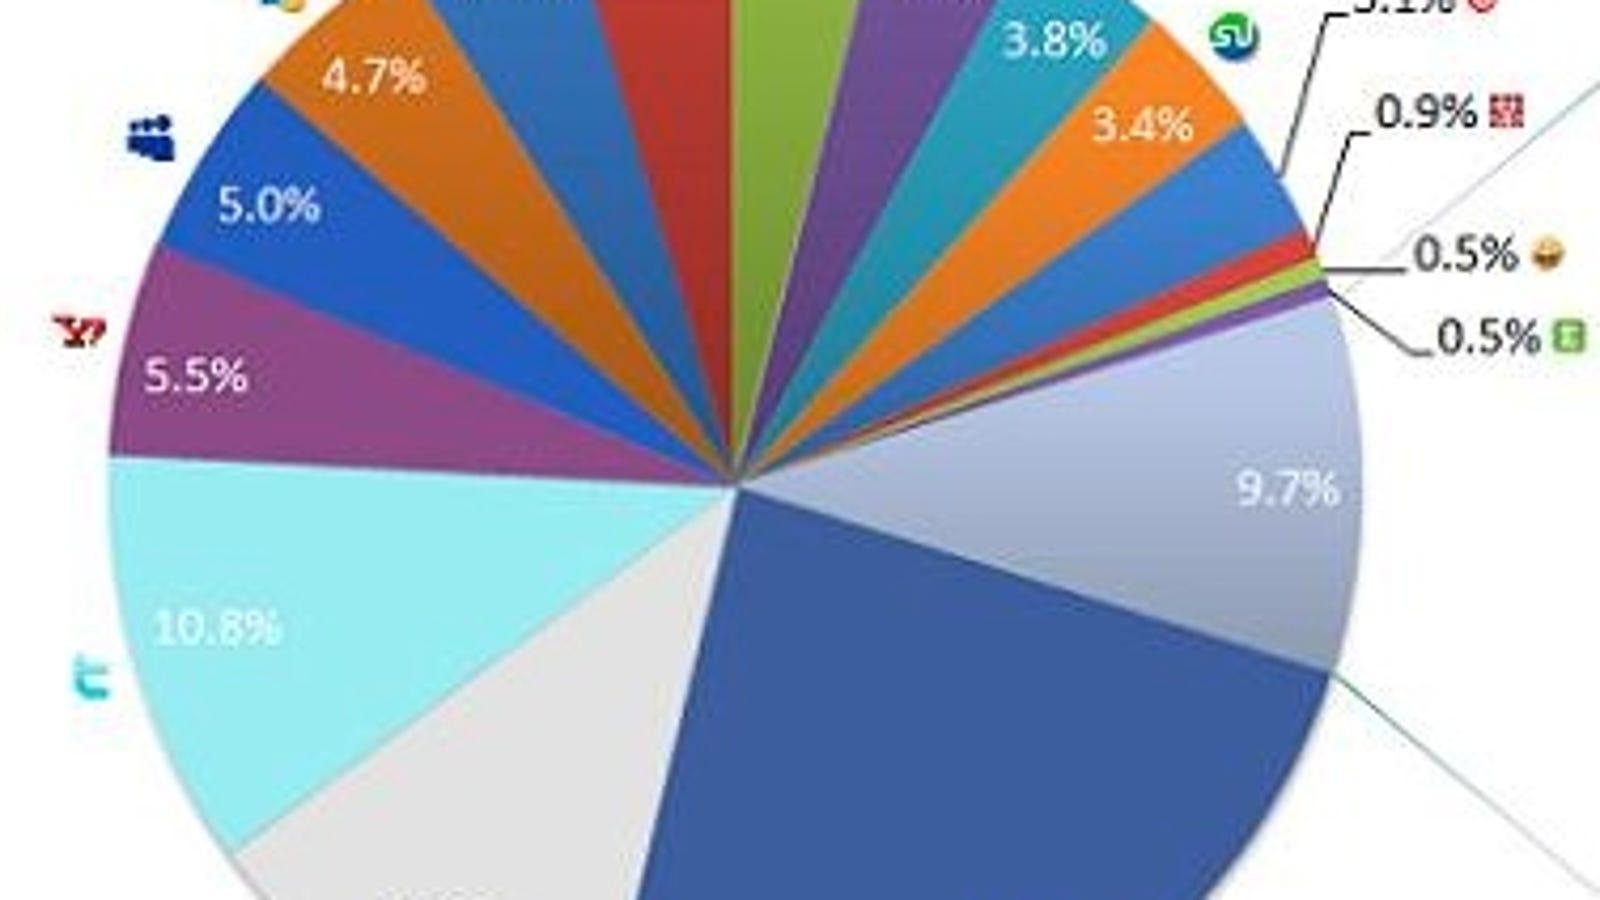 How Do You Share Links over the Internet?